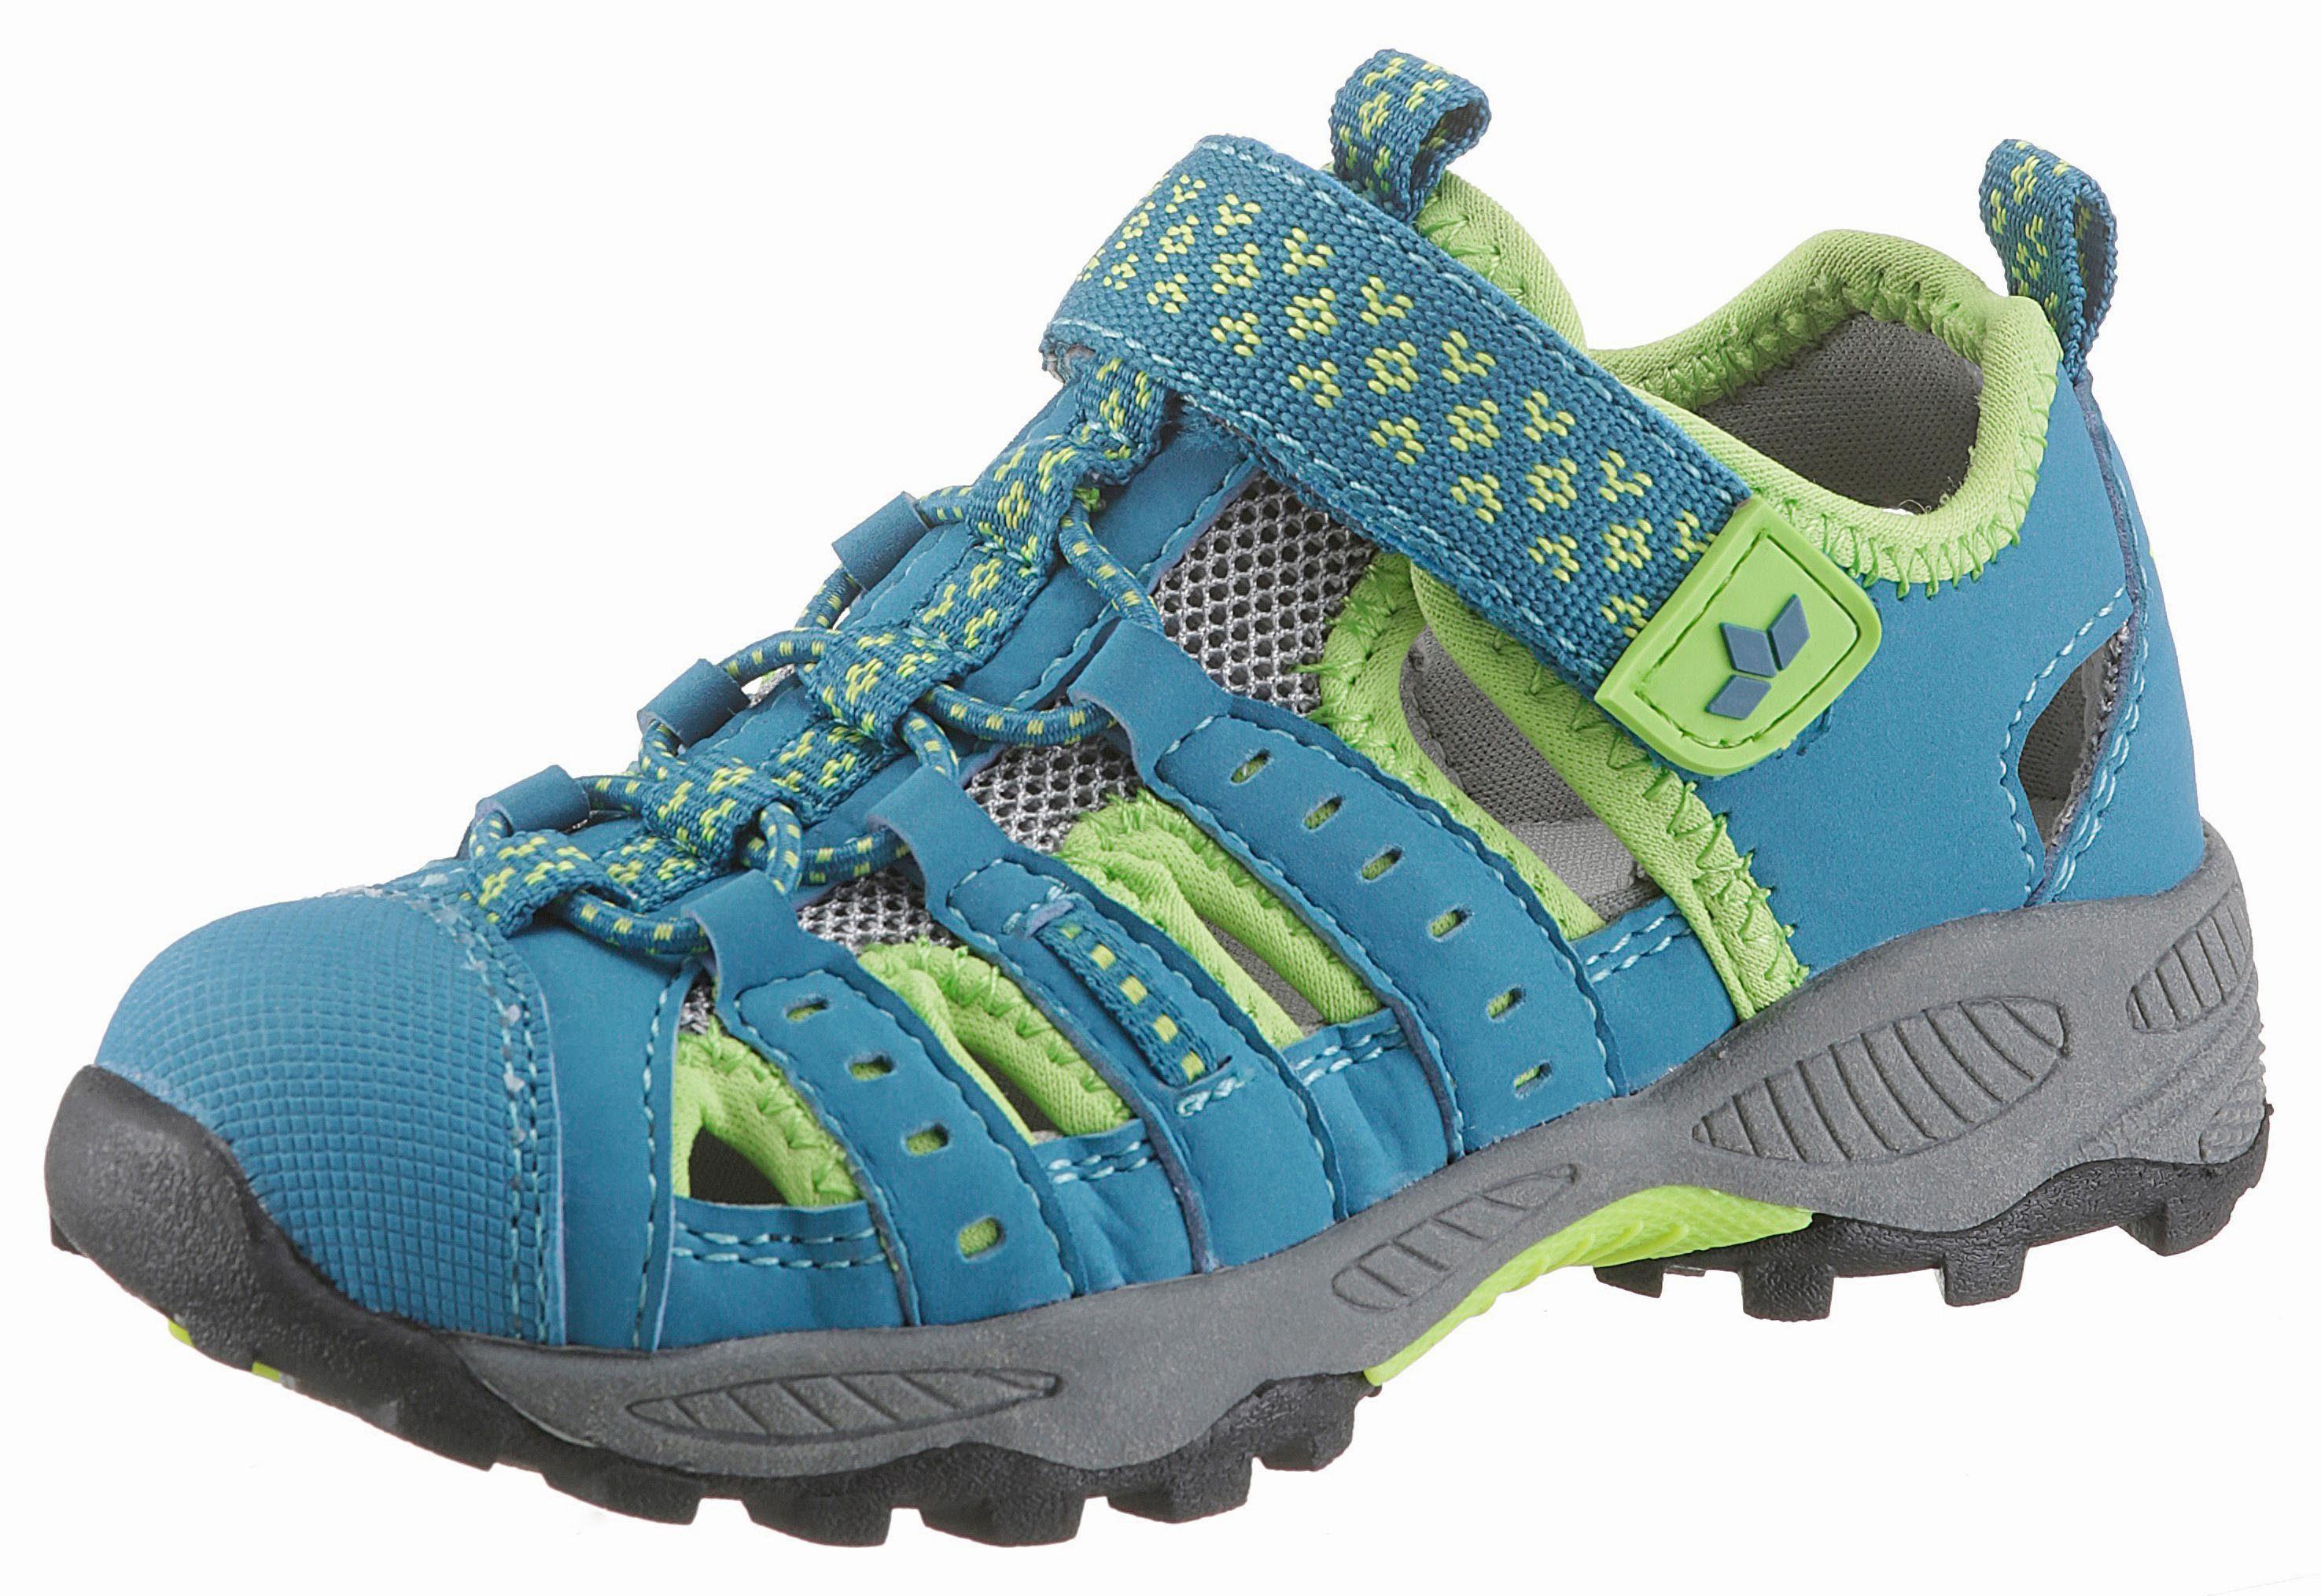 Lico »Beat VS« Sandale, in modischer Farbkombination, blau, blau-grün